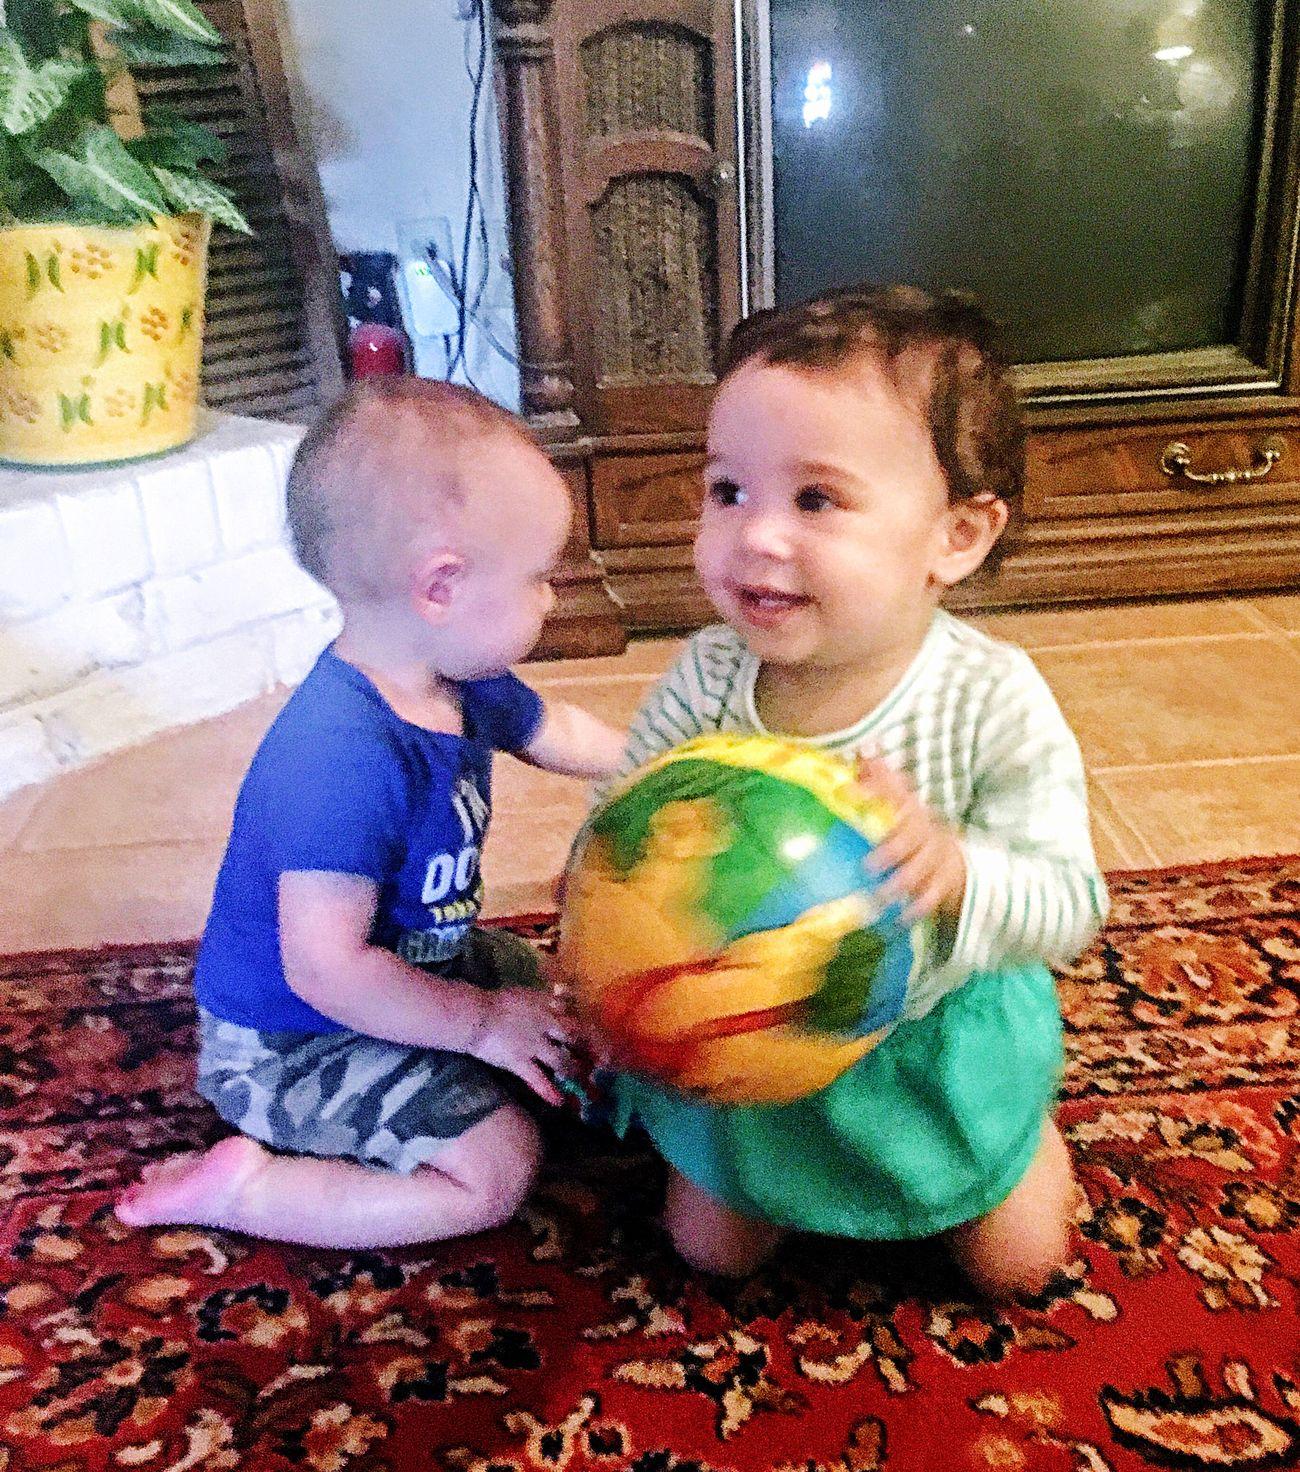 Babies Cousins  Togetherness Baby Childhood Indoors  Cute Bonding Sweetness Grandchildren My sweet babies 😘🌺🌼 love these grandchildren 😘